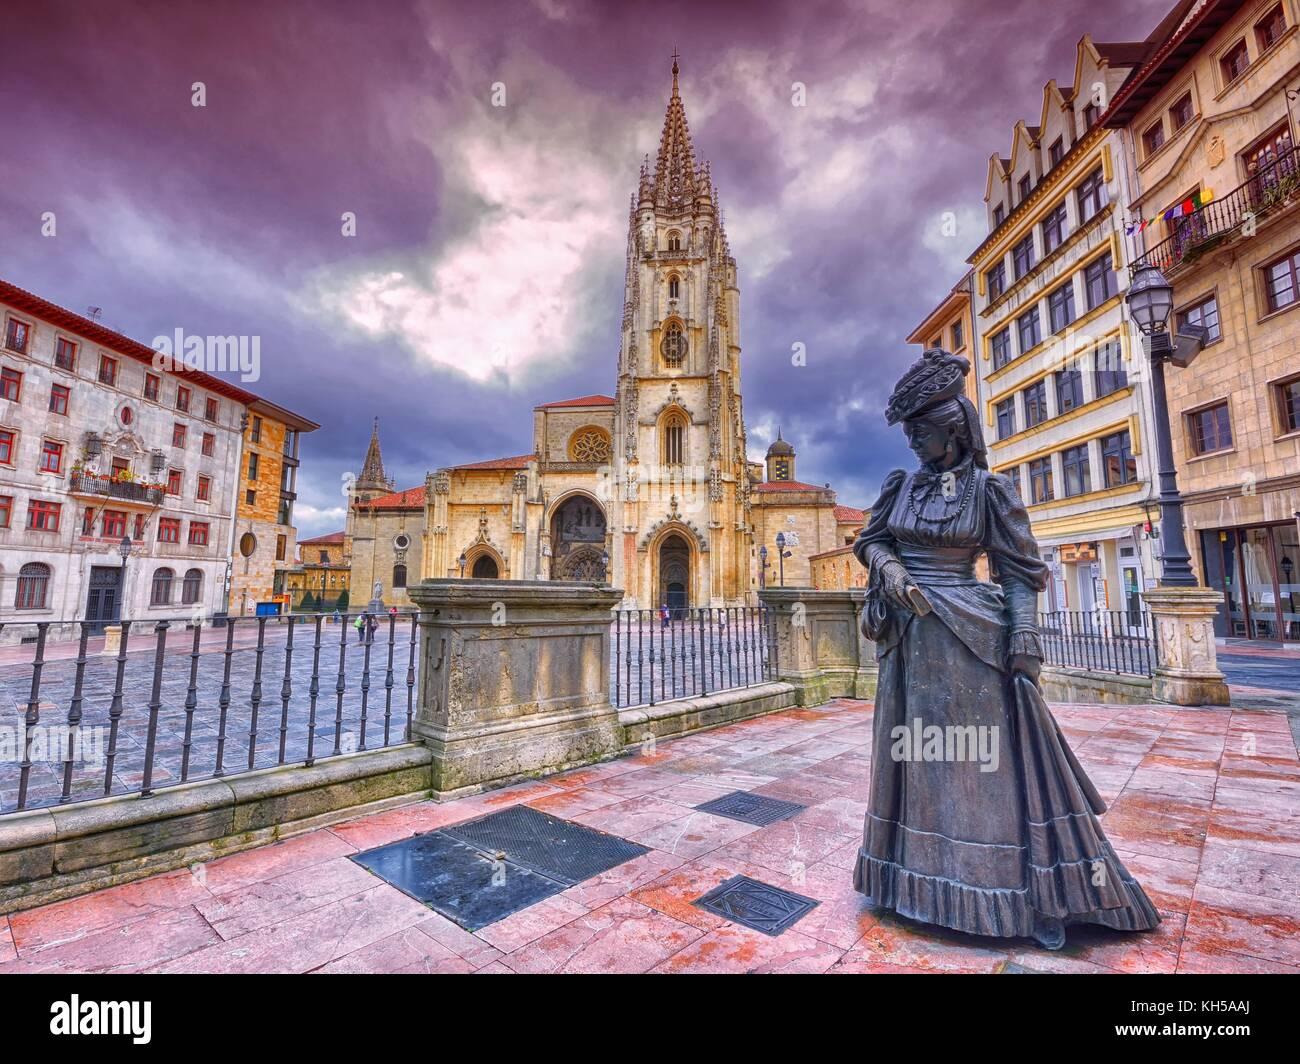 Cathedral of San Salvador and statue of La Regenta. Oviedo, Asturias, Spain.